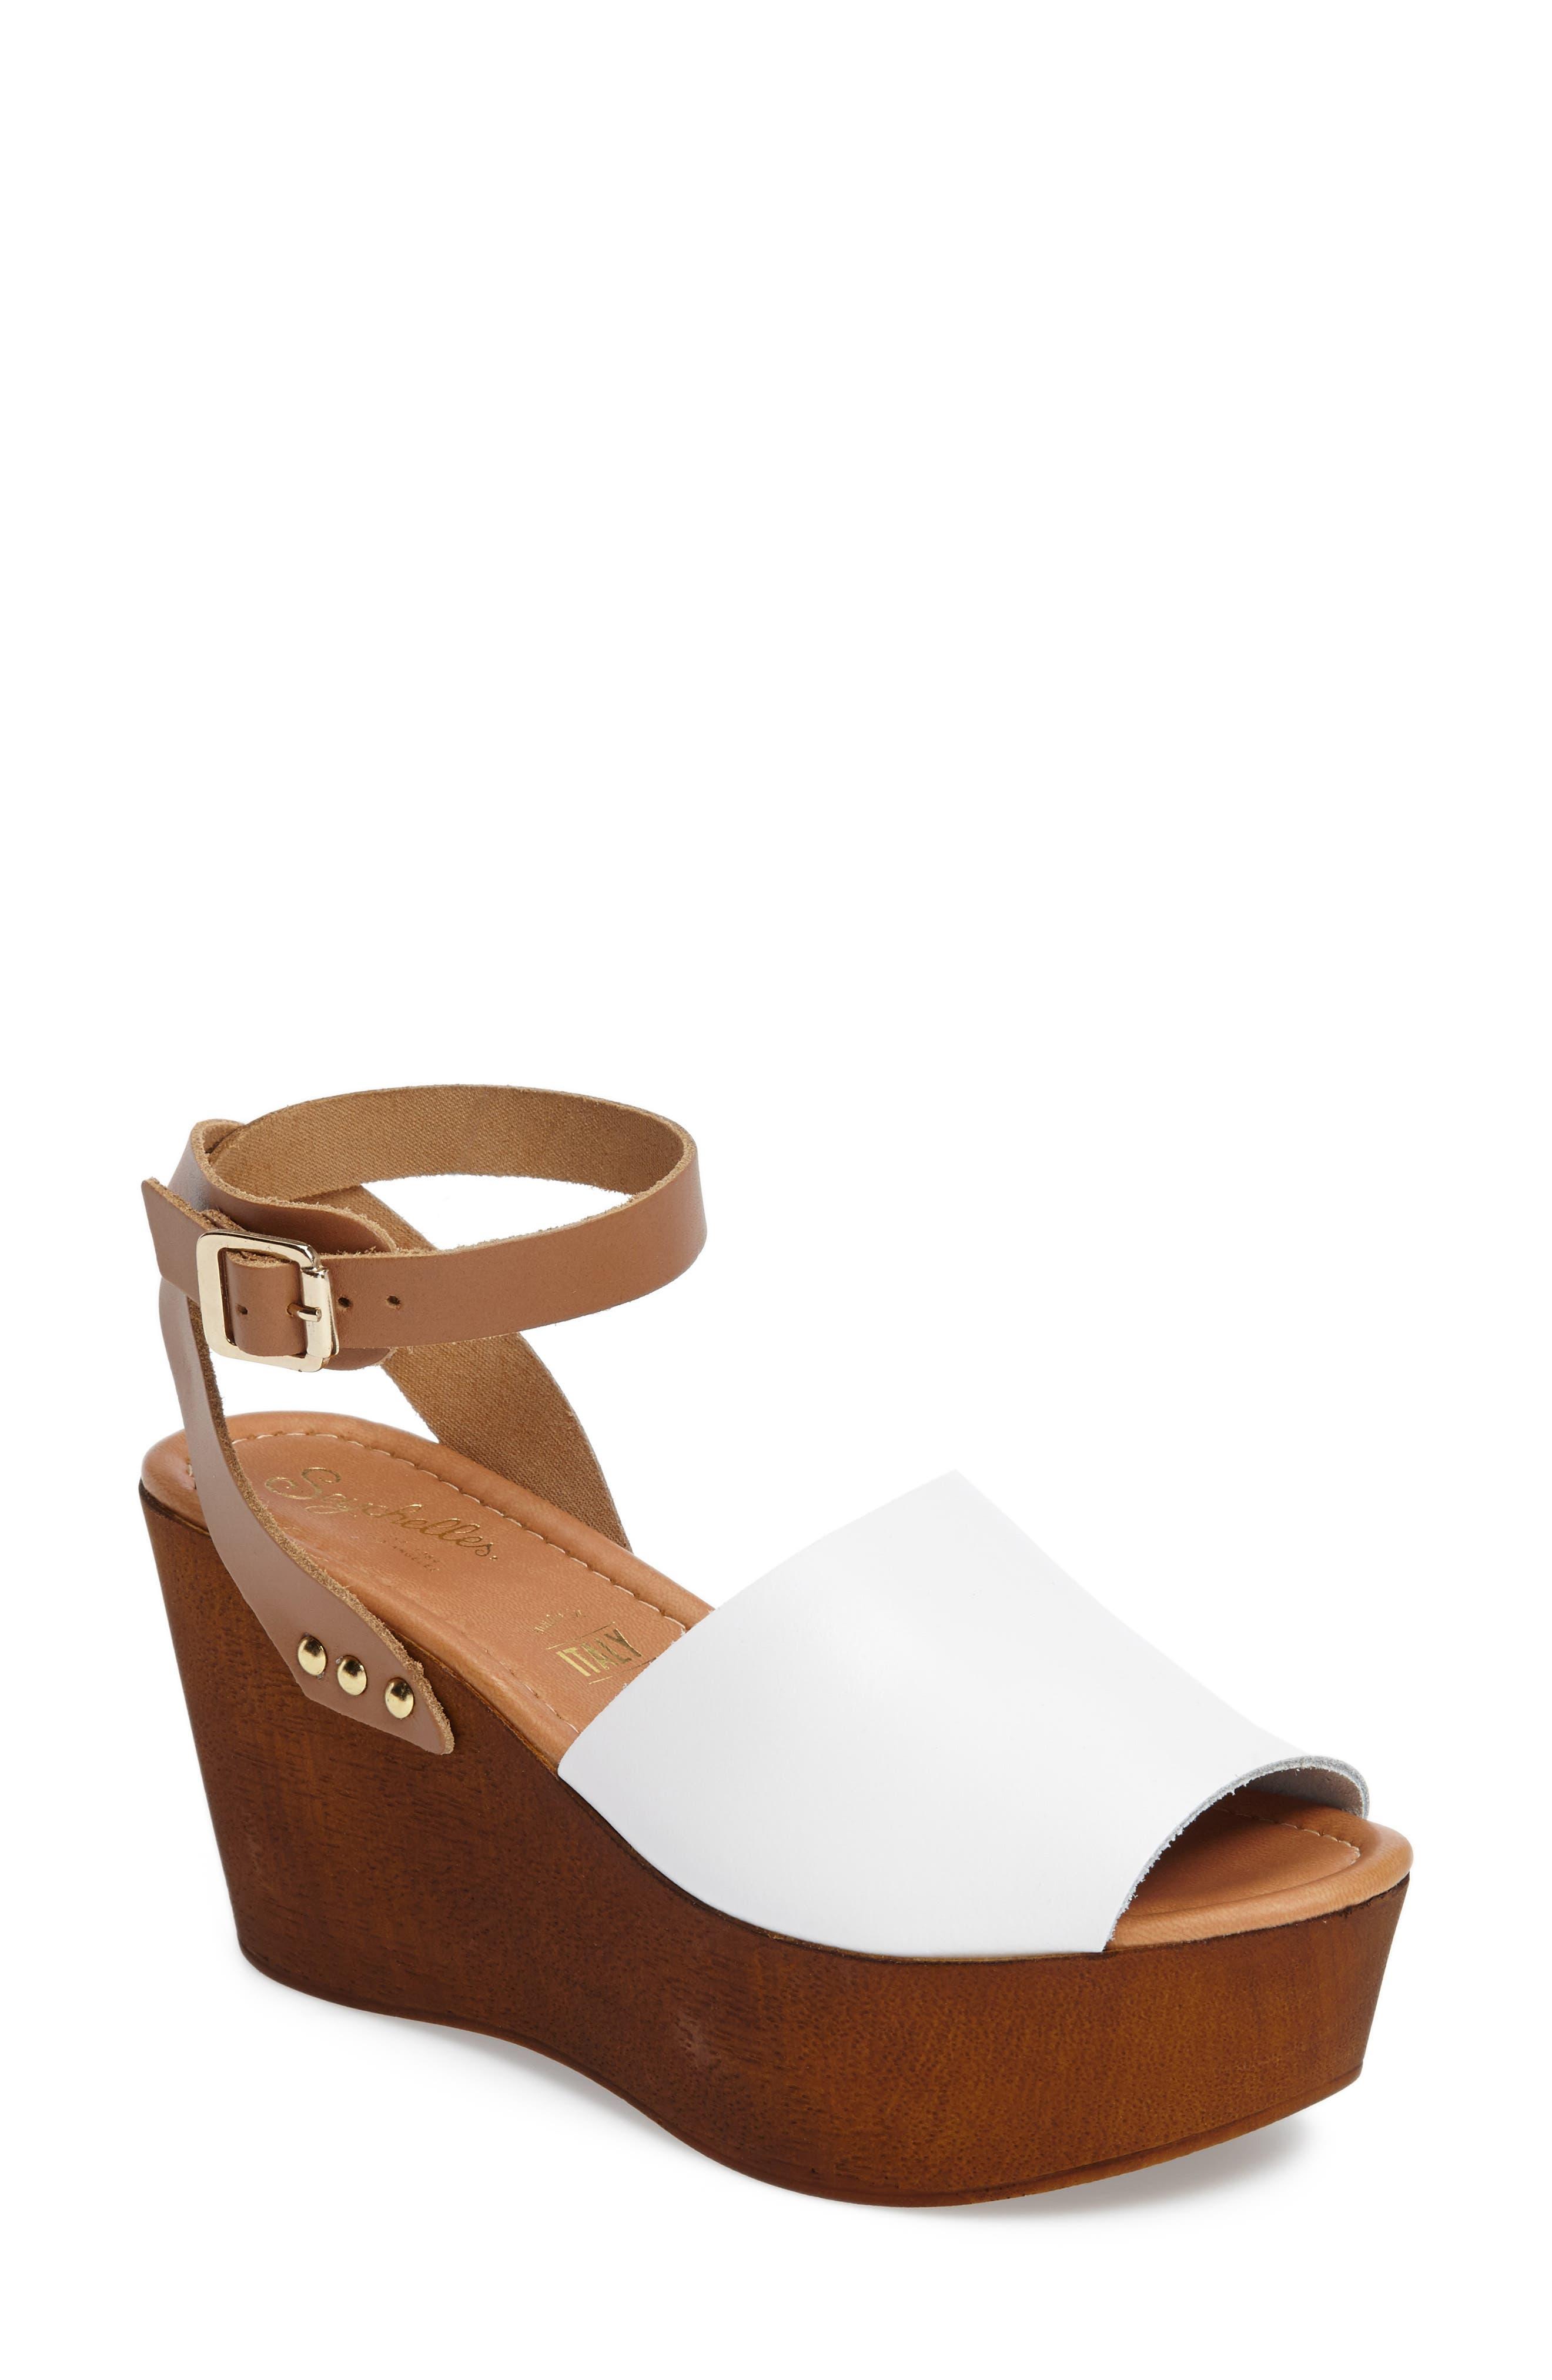 Alternate Image 1 Selected - Seychelles Platform Wedge Sandal (Women)